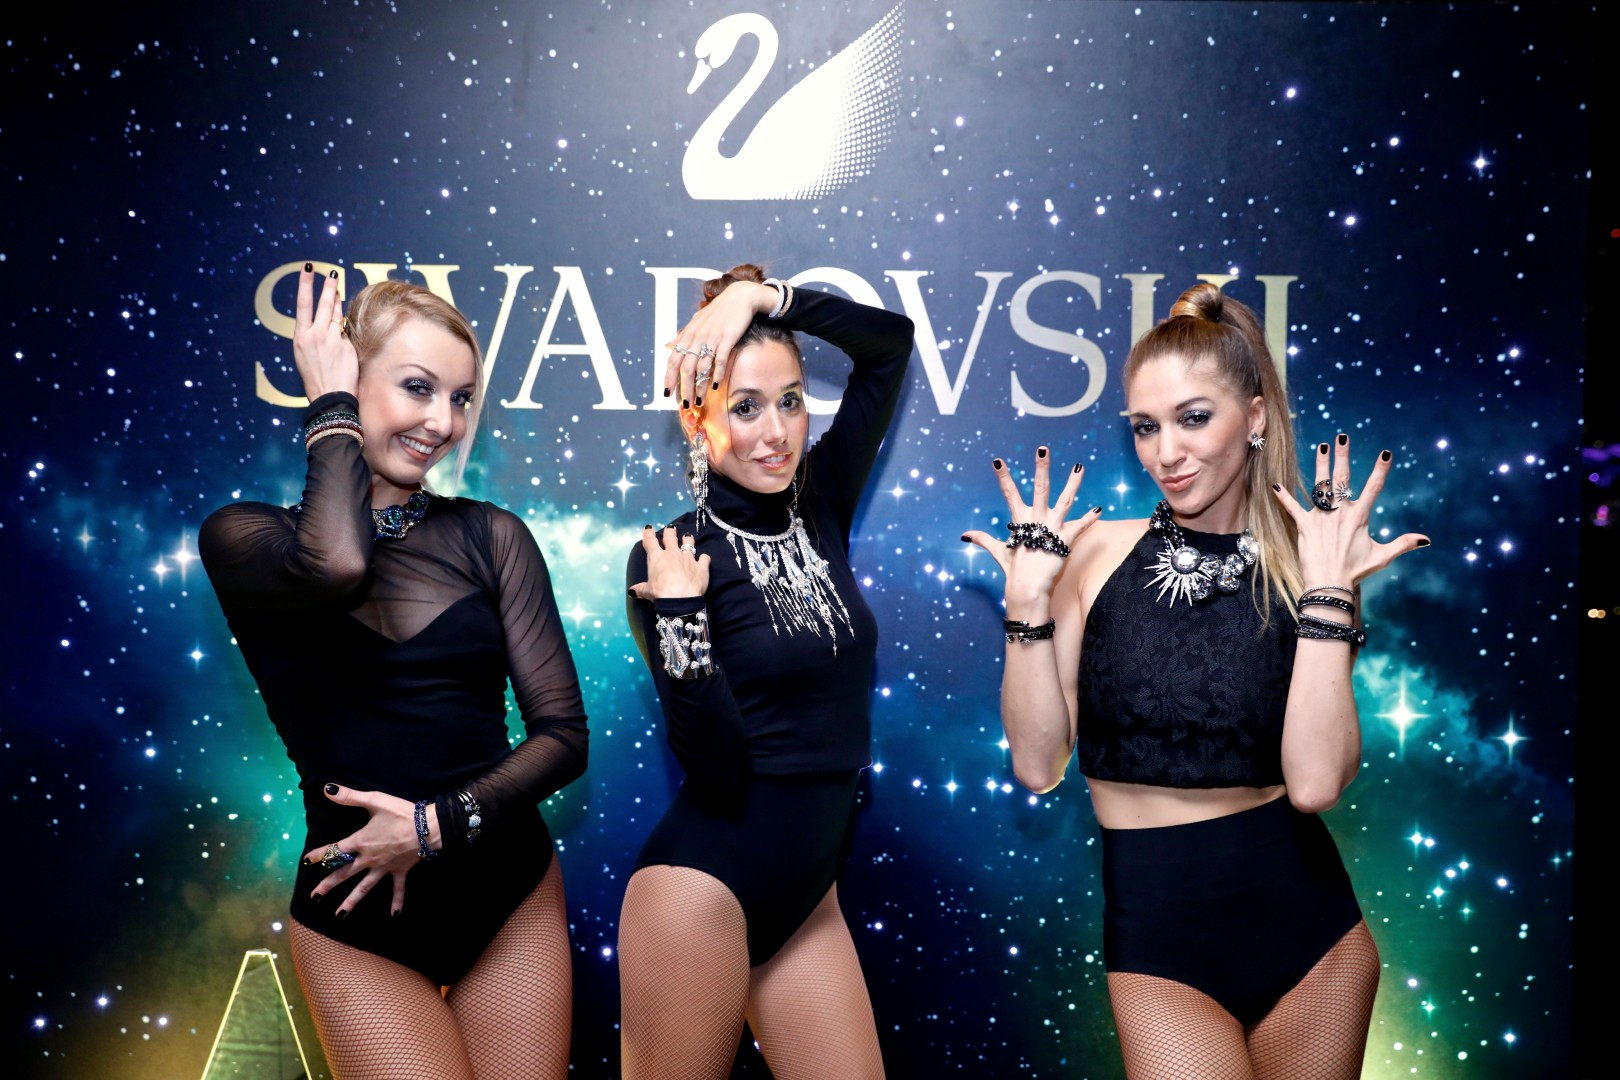 swarovski-performers